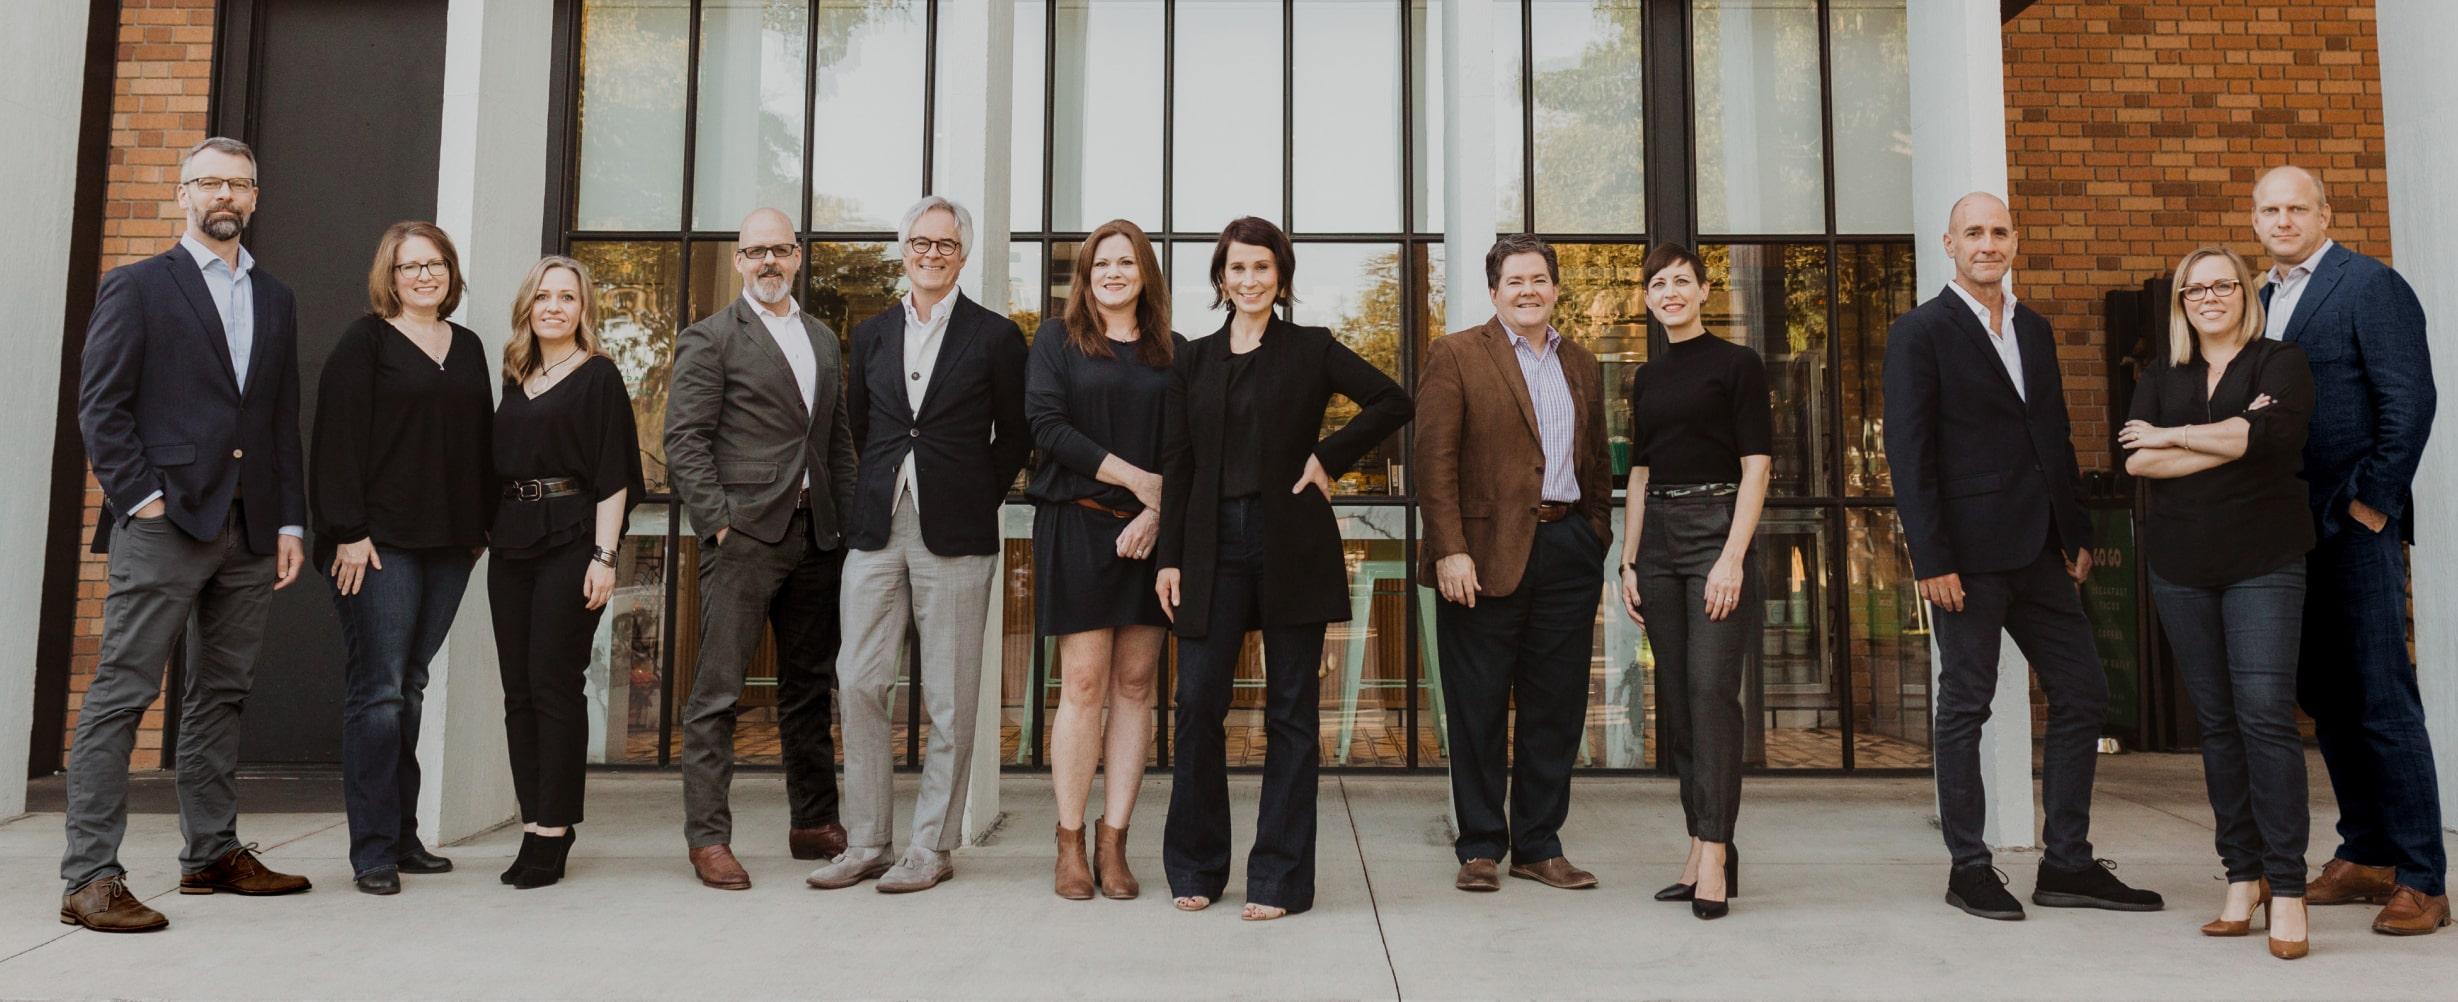 Image of Looney & Associates team